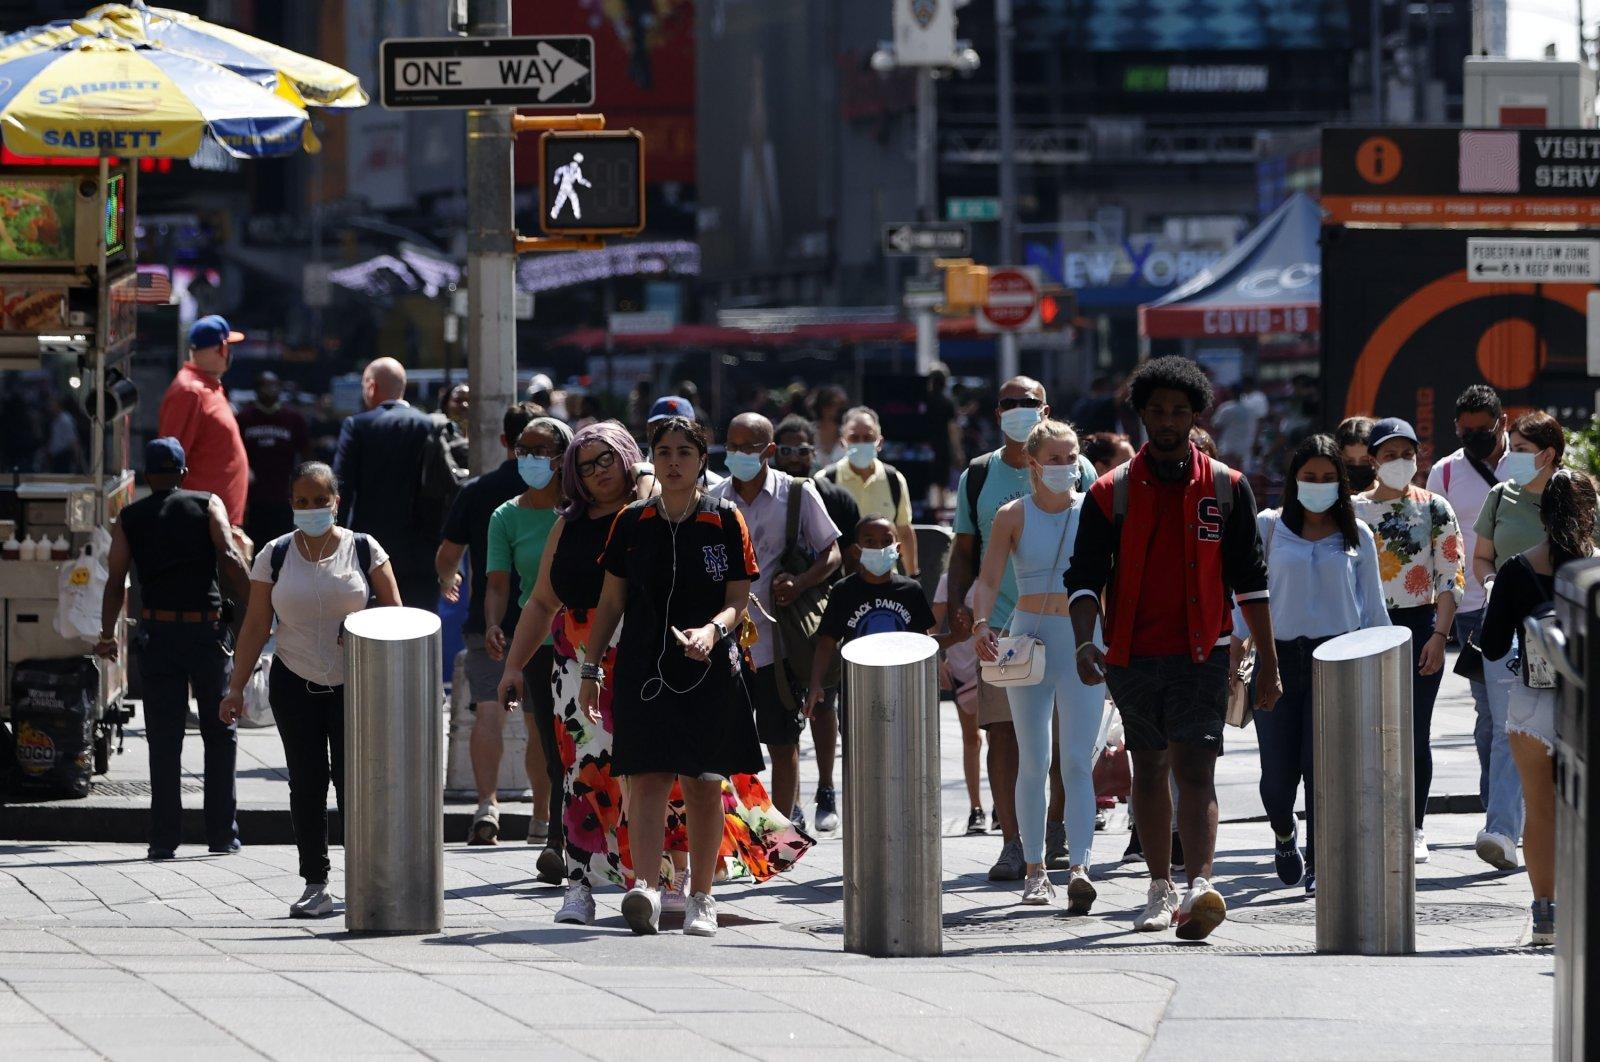 People walk through Times Square in New York, U.S., Aug. 12, 2021. (EPA Photo)